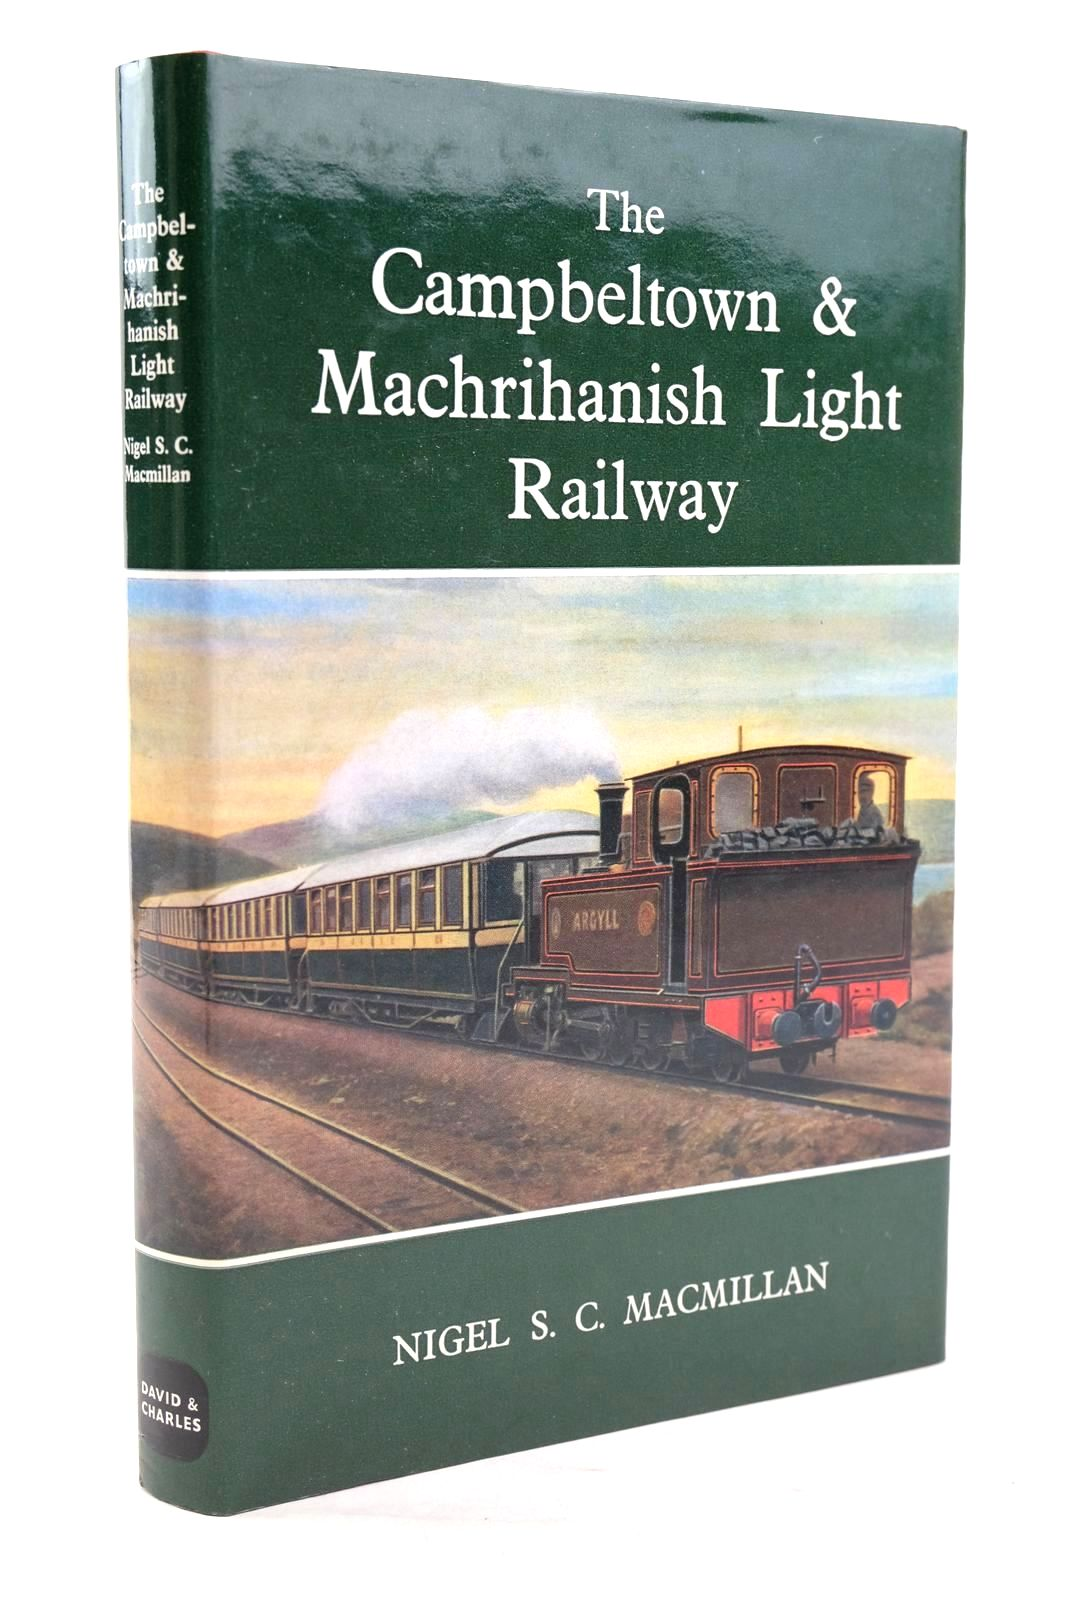 Photo of THE CAMPBELTOWN & MACHRIHANISH LIGHT RAILWAY- Stock Number: 1319931